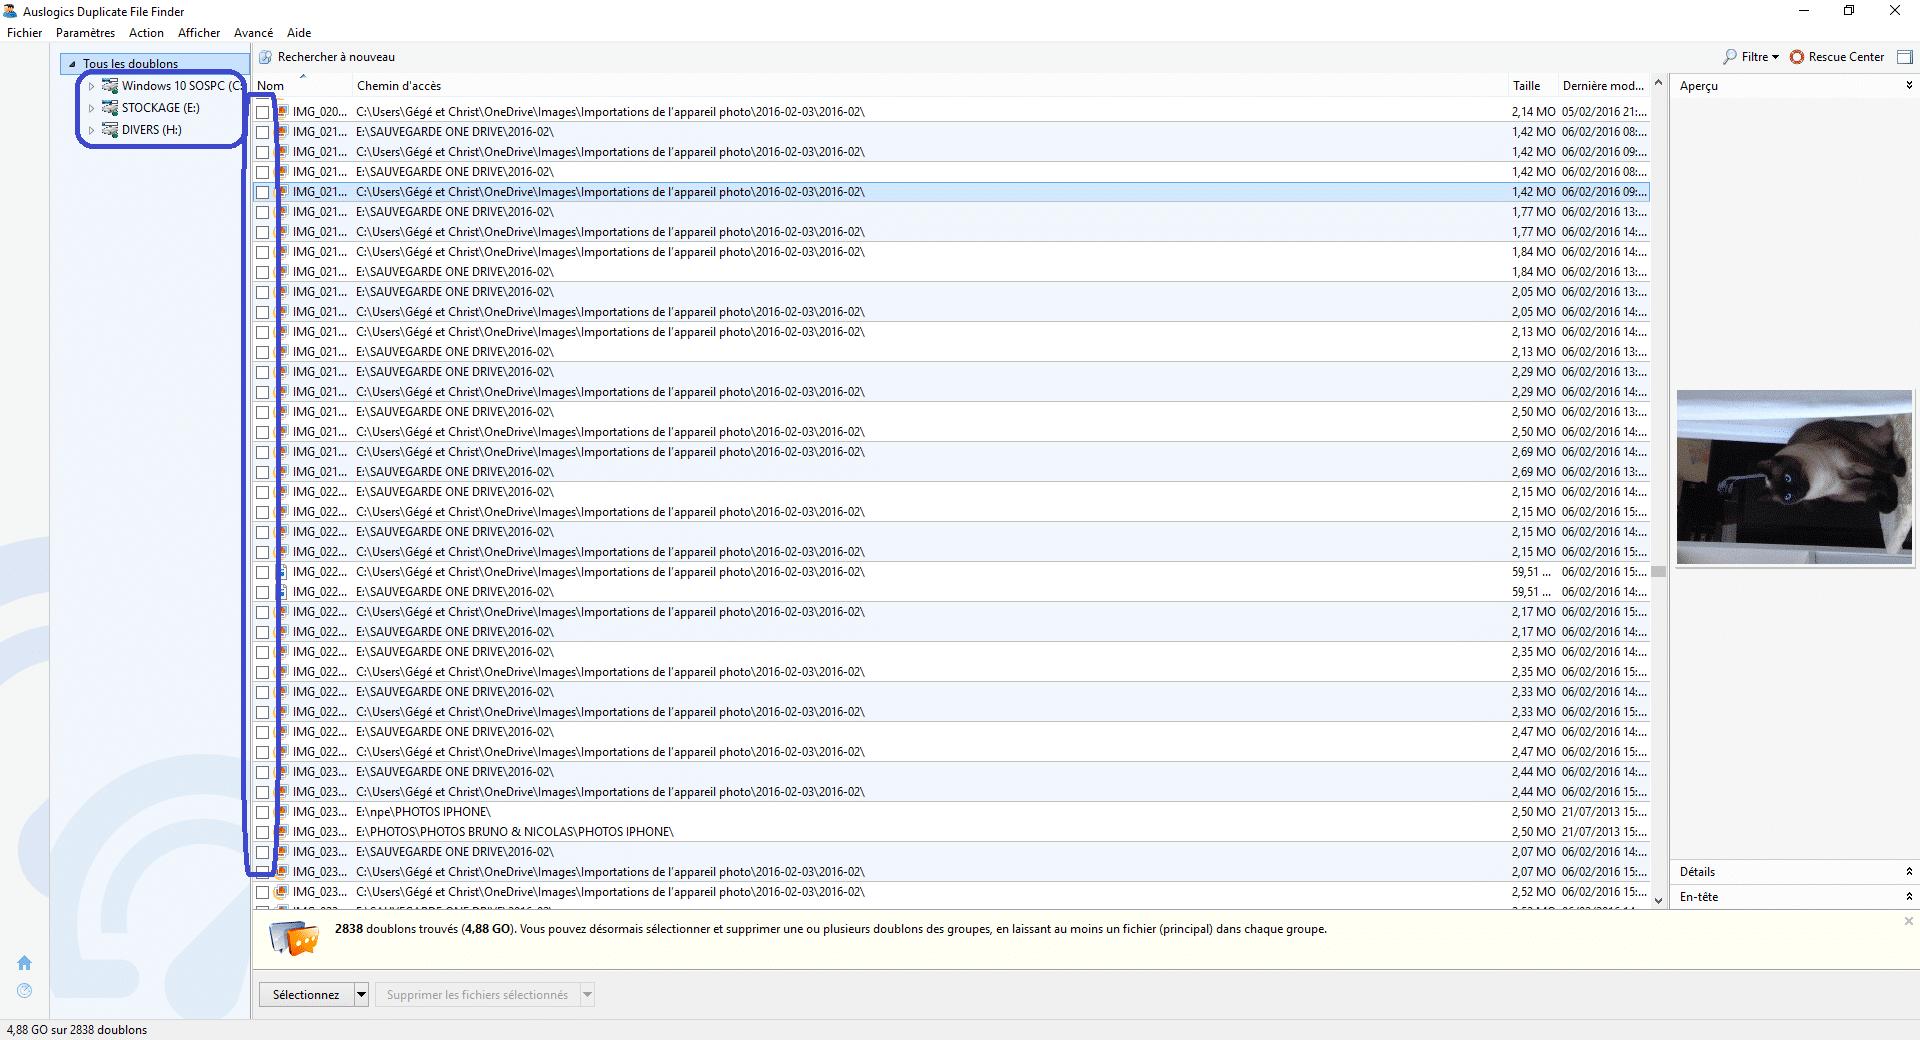 Duplicate File Finder tutoriel 12